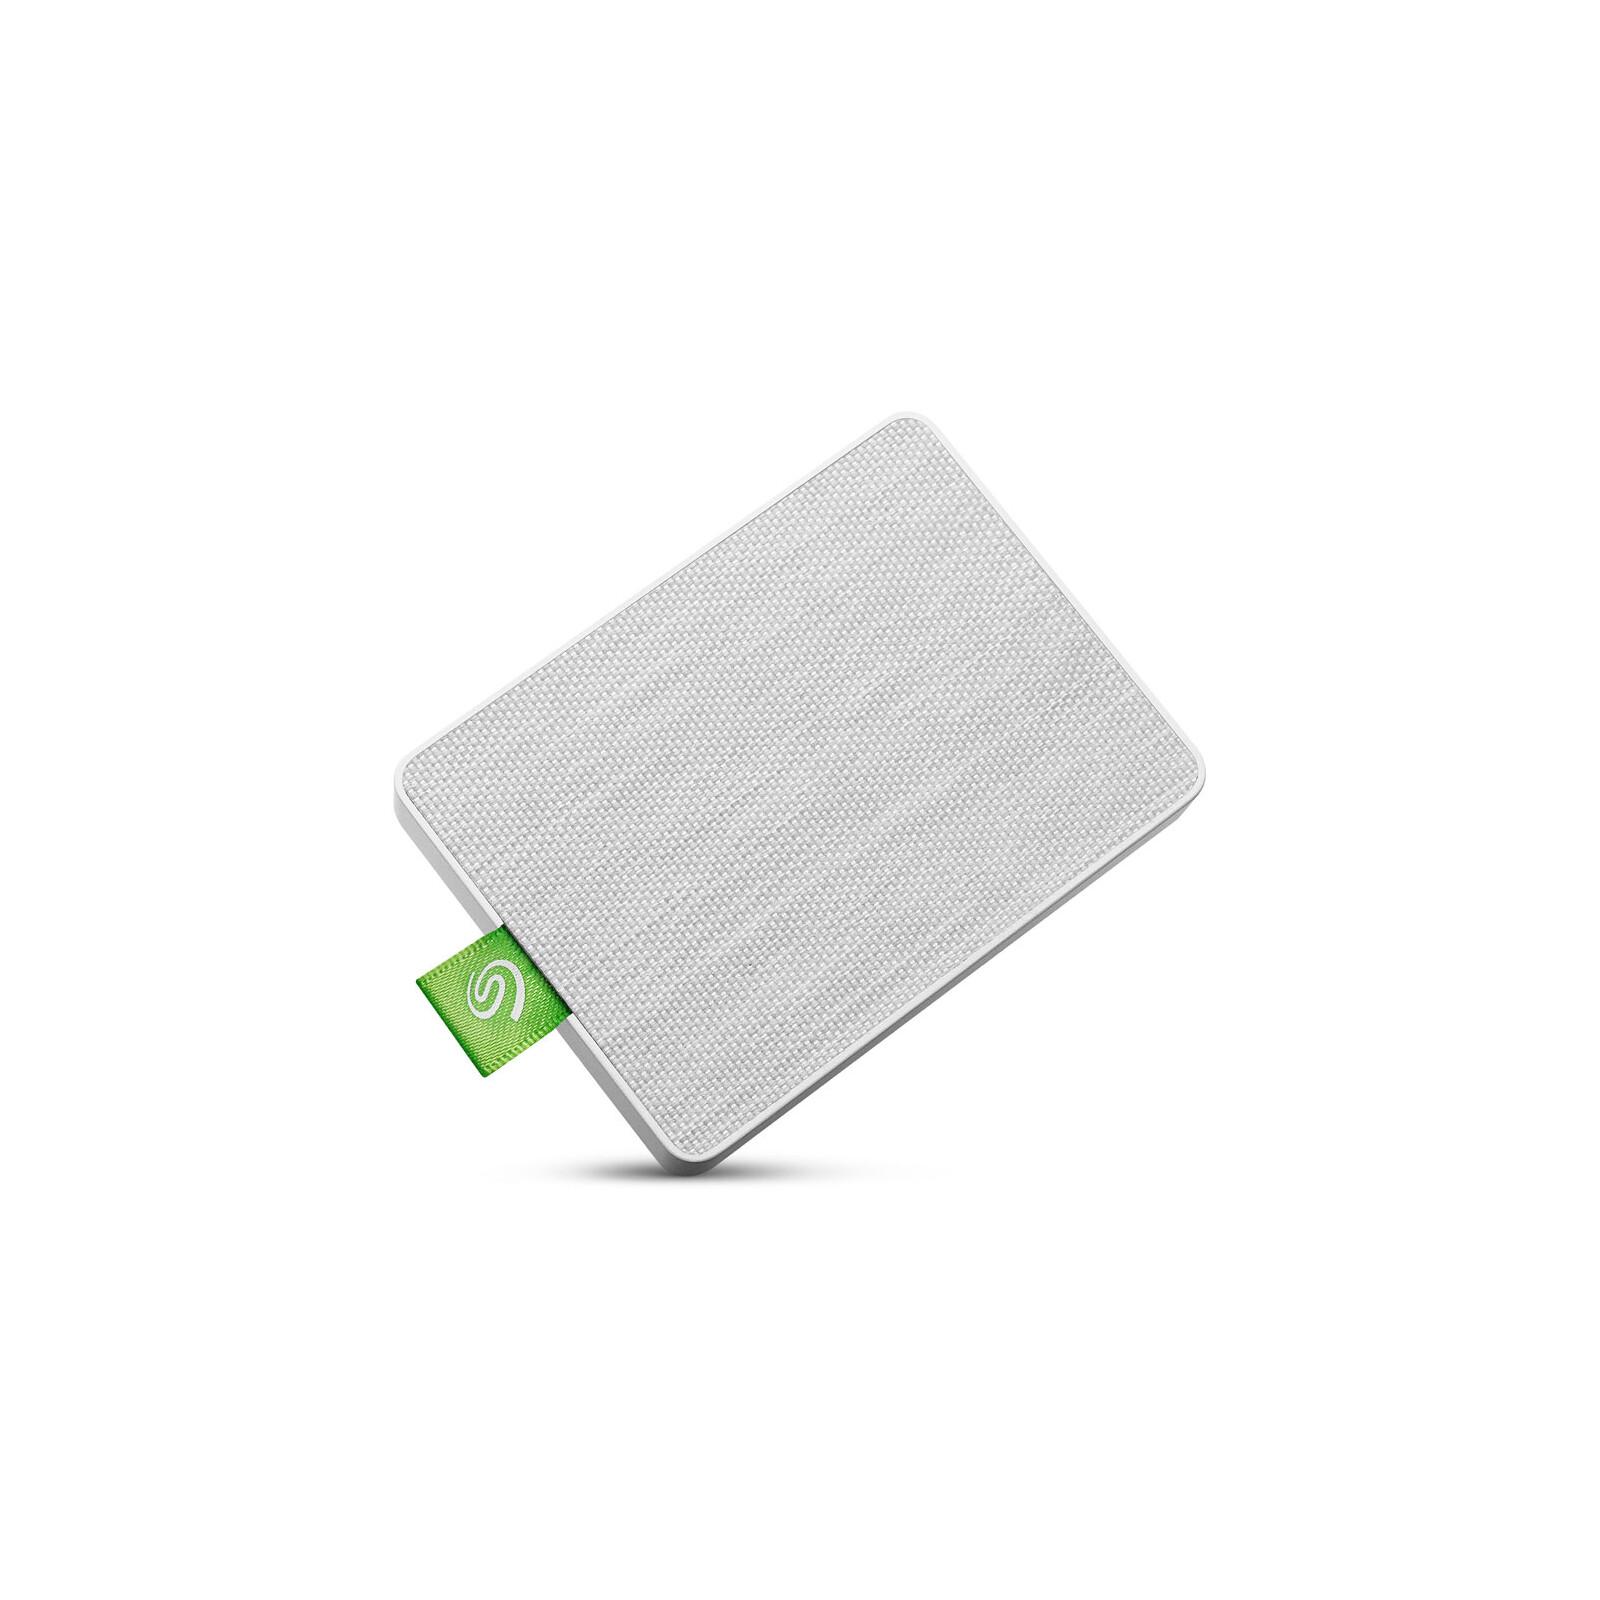 Seagate Ultra Touch SSD 1TB extern USB 3.0 black